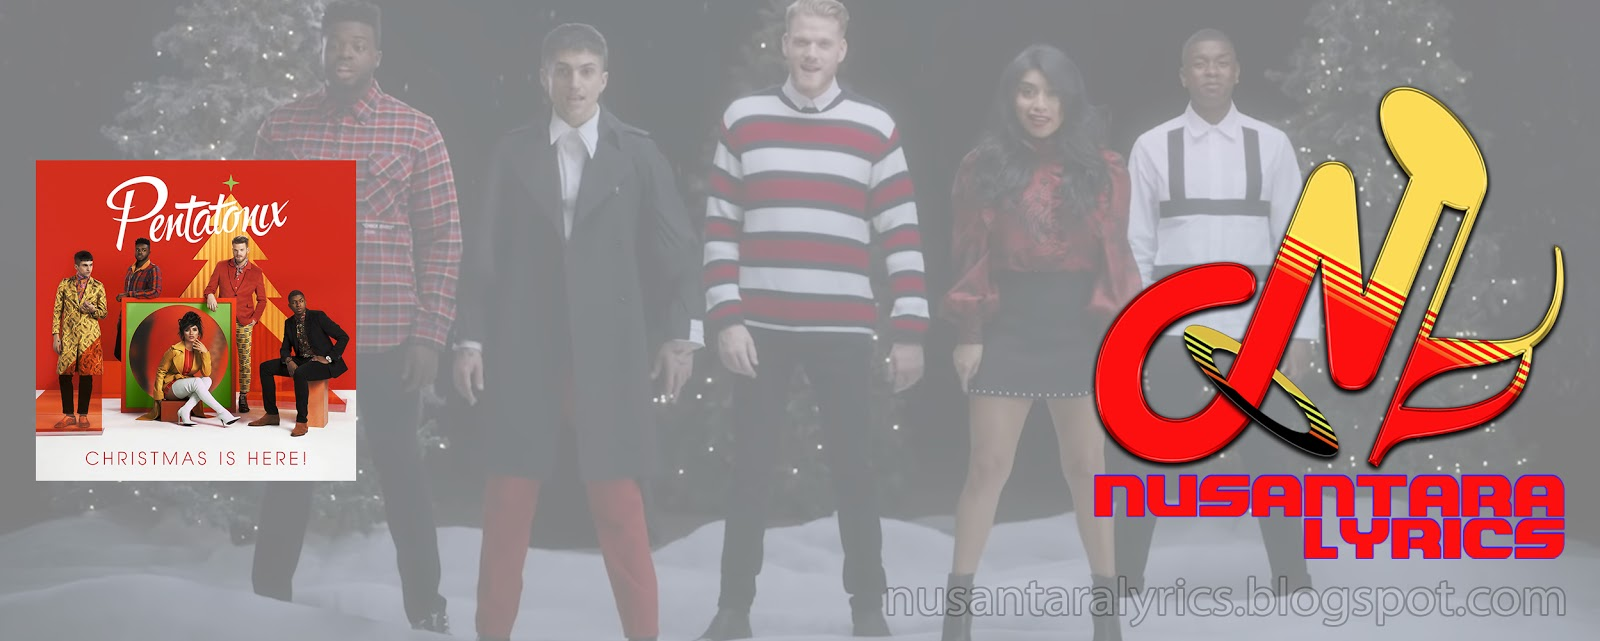 Pentatonix Making Christmas.Pentatonix Making Christmas Nusantara Lyrics